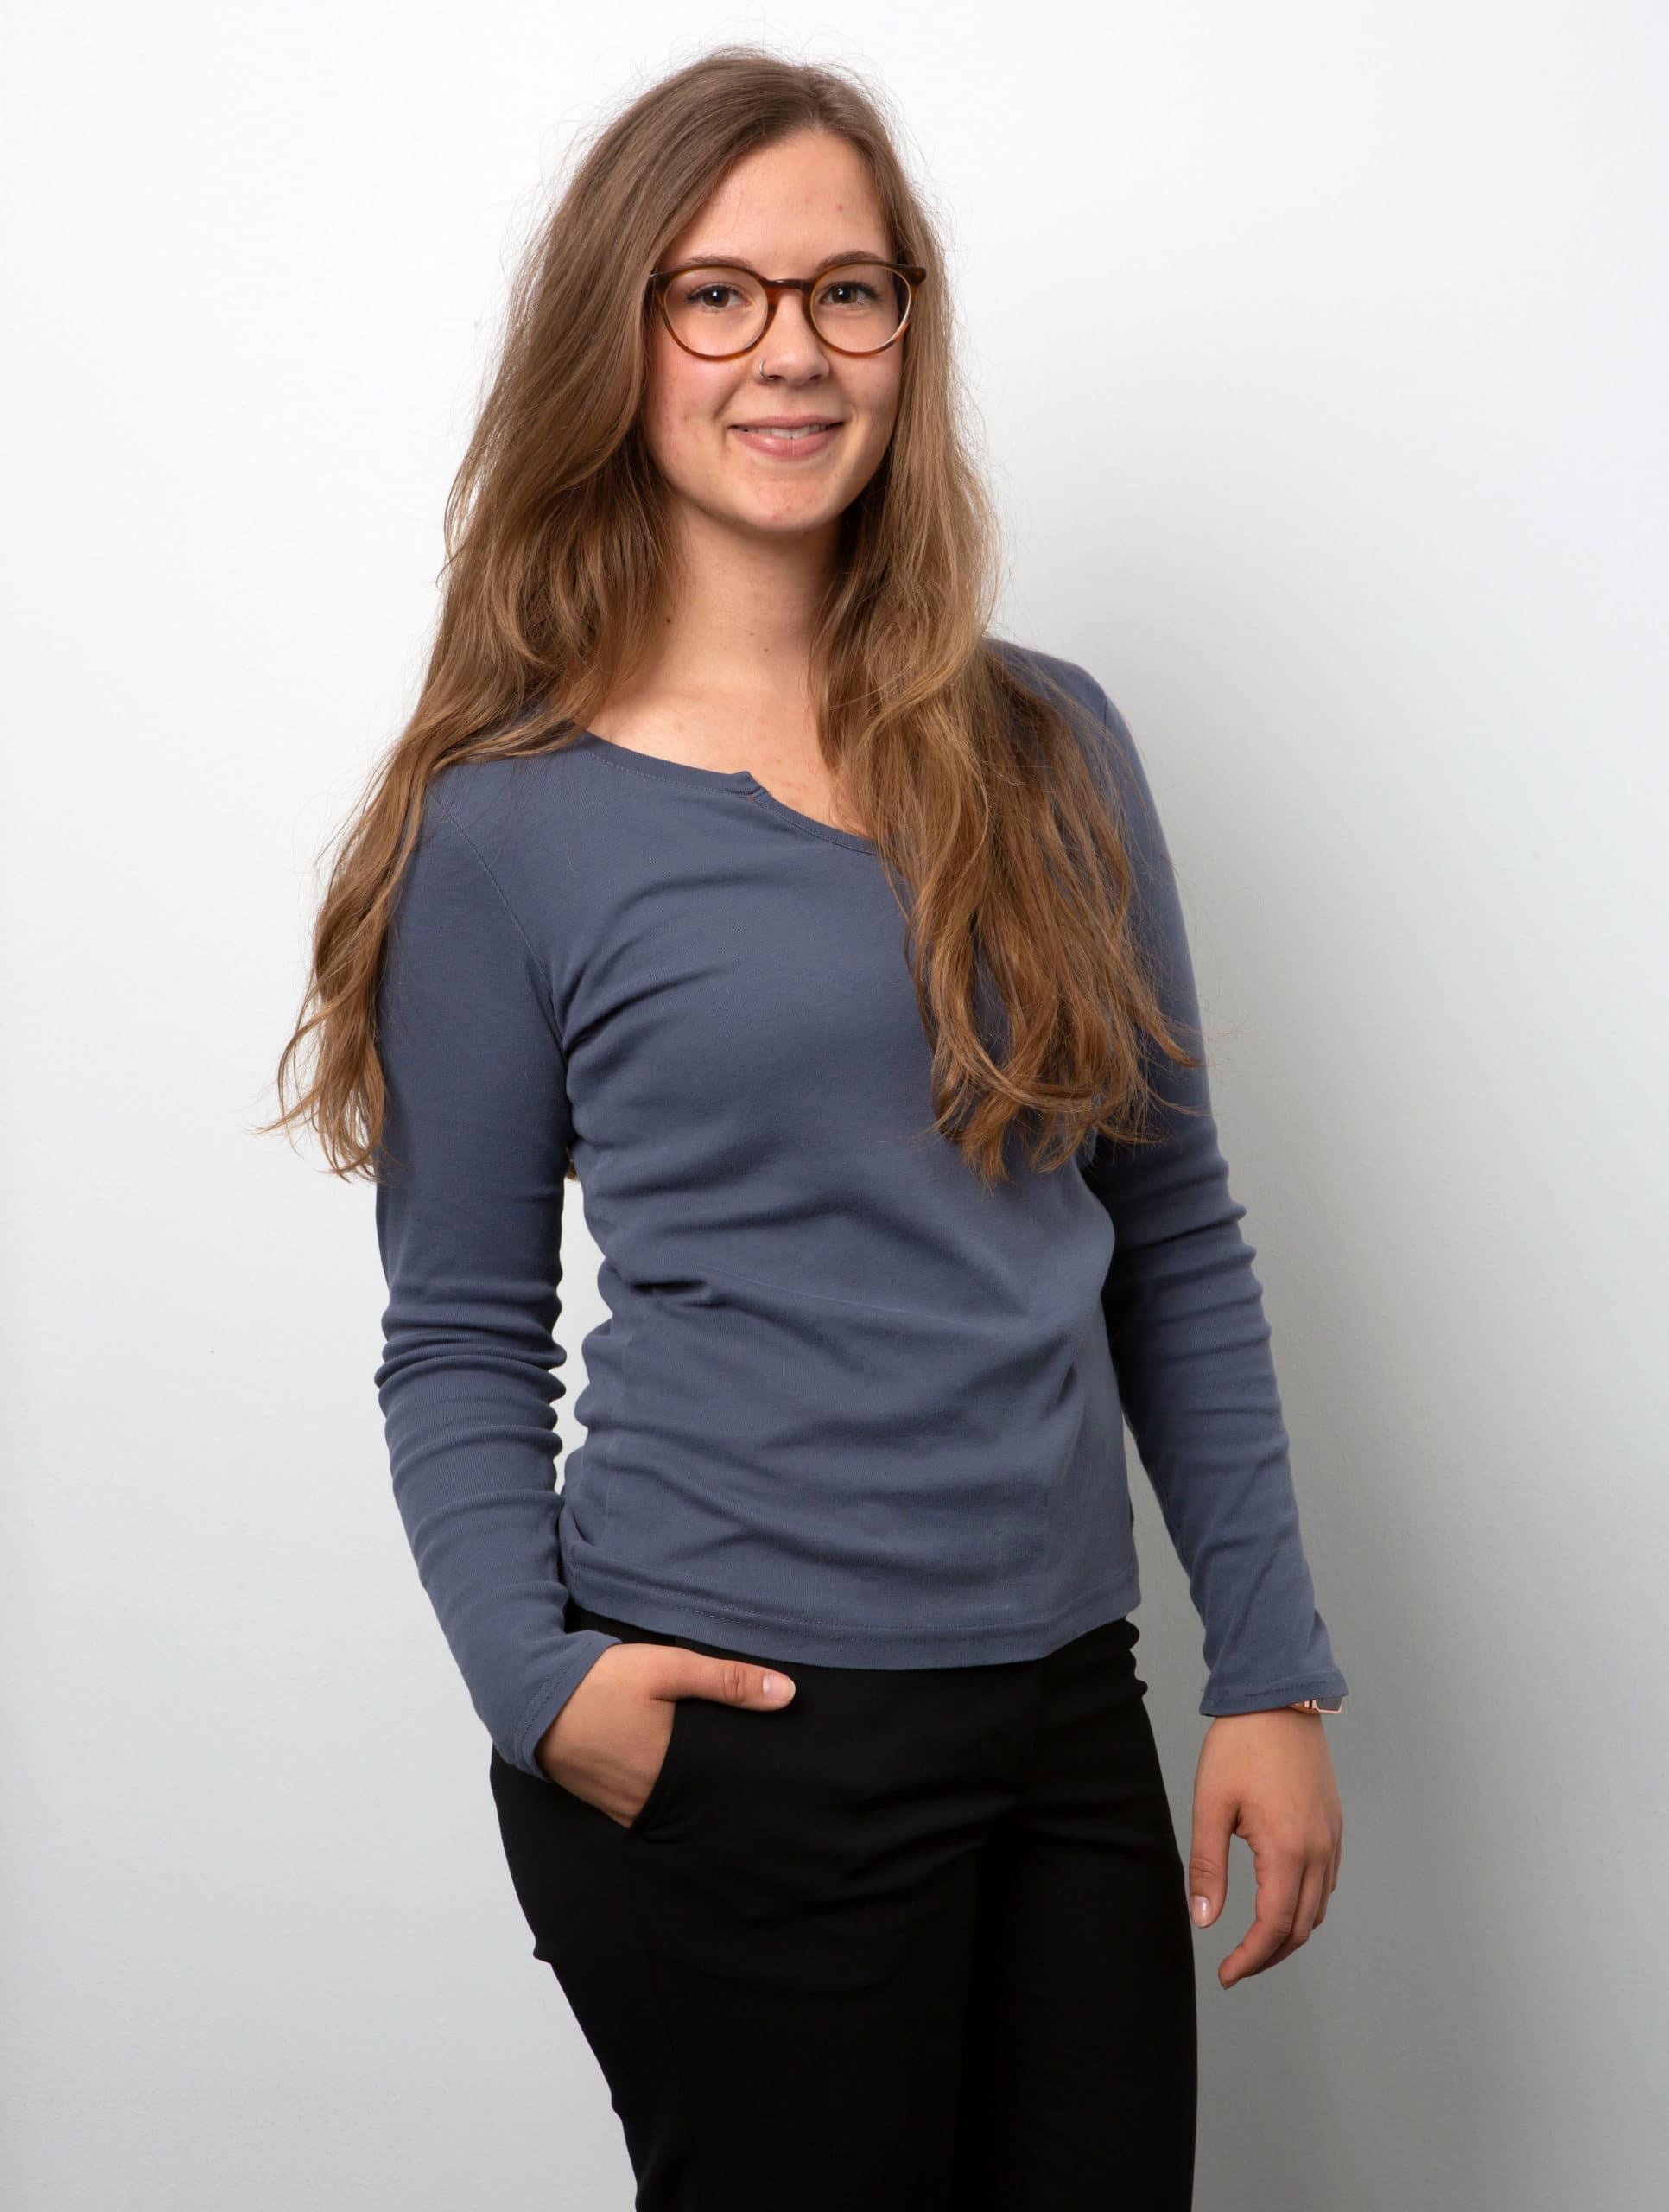 Yasmina Schwarz